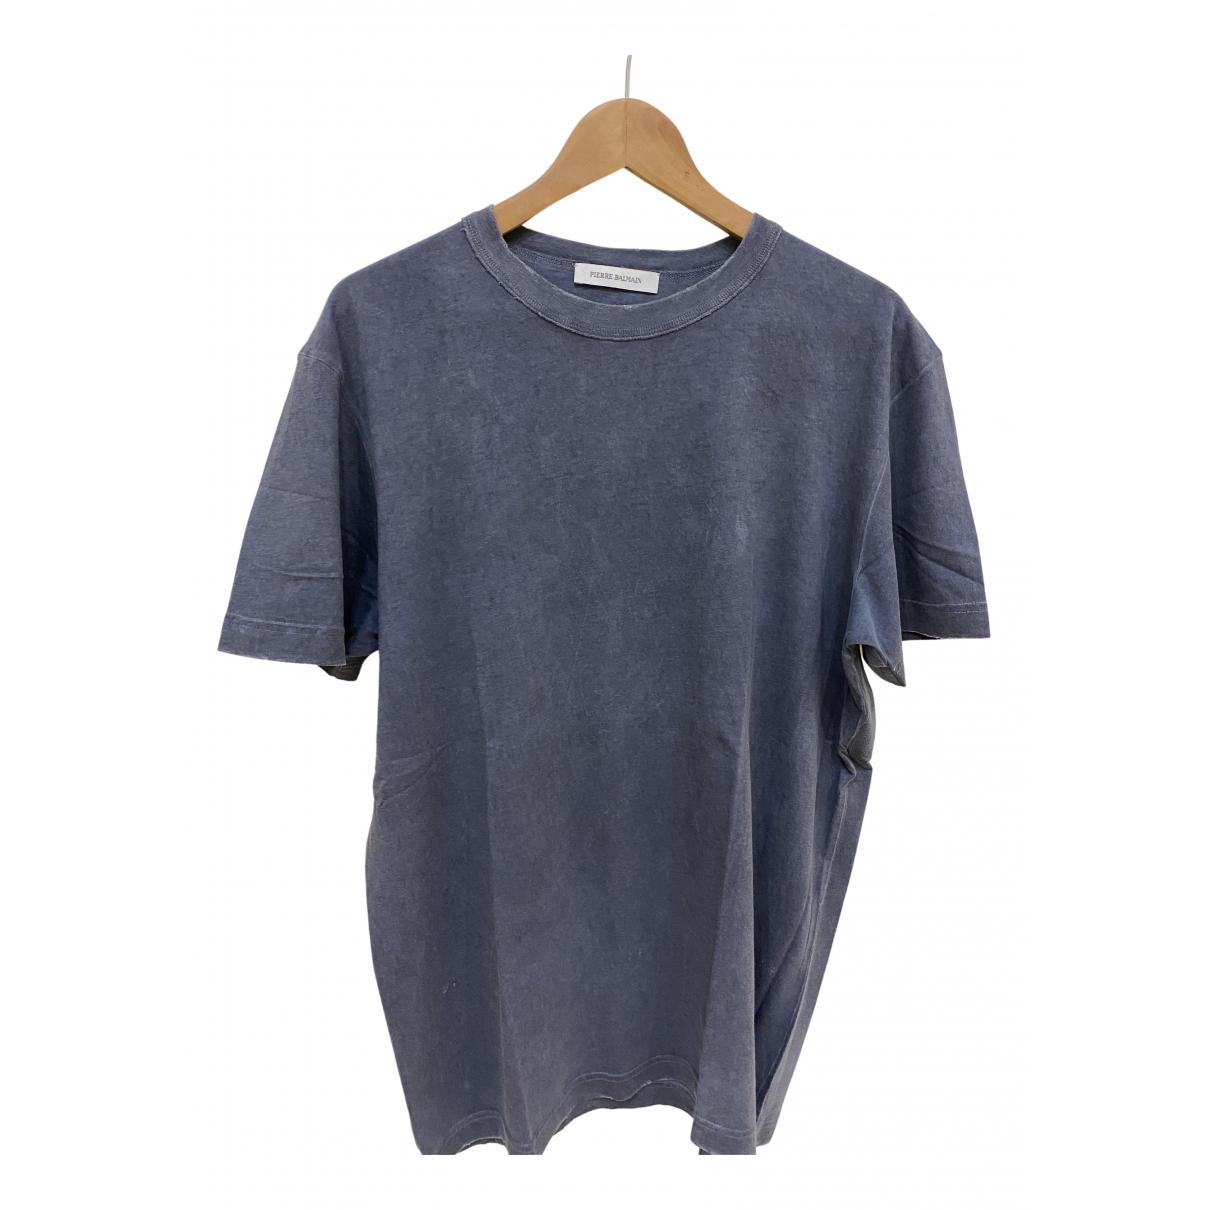 Pierre Balmain N Grey Cotton T-shirts for Men XL International